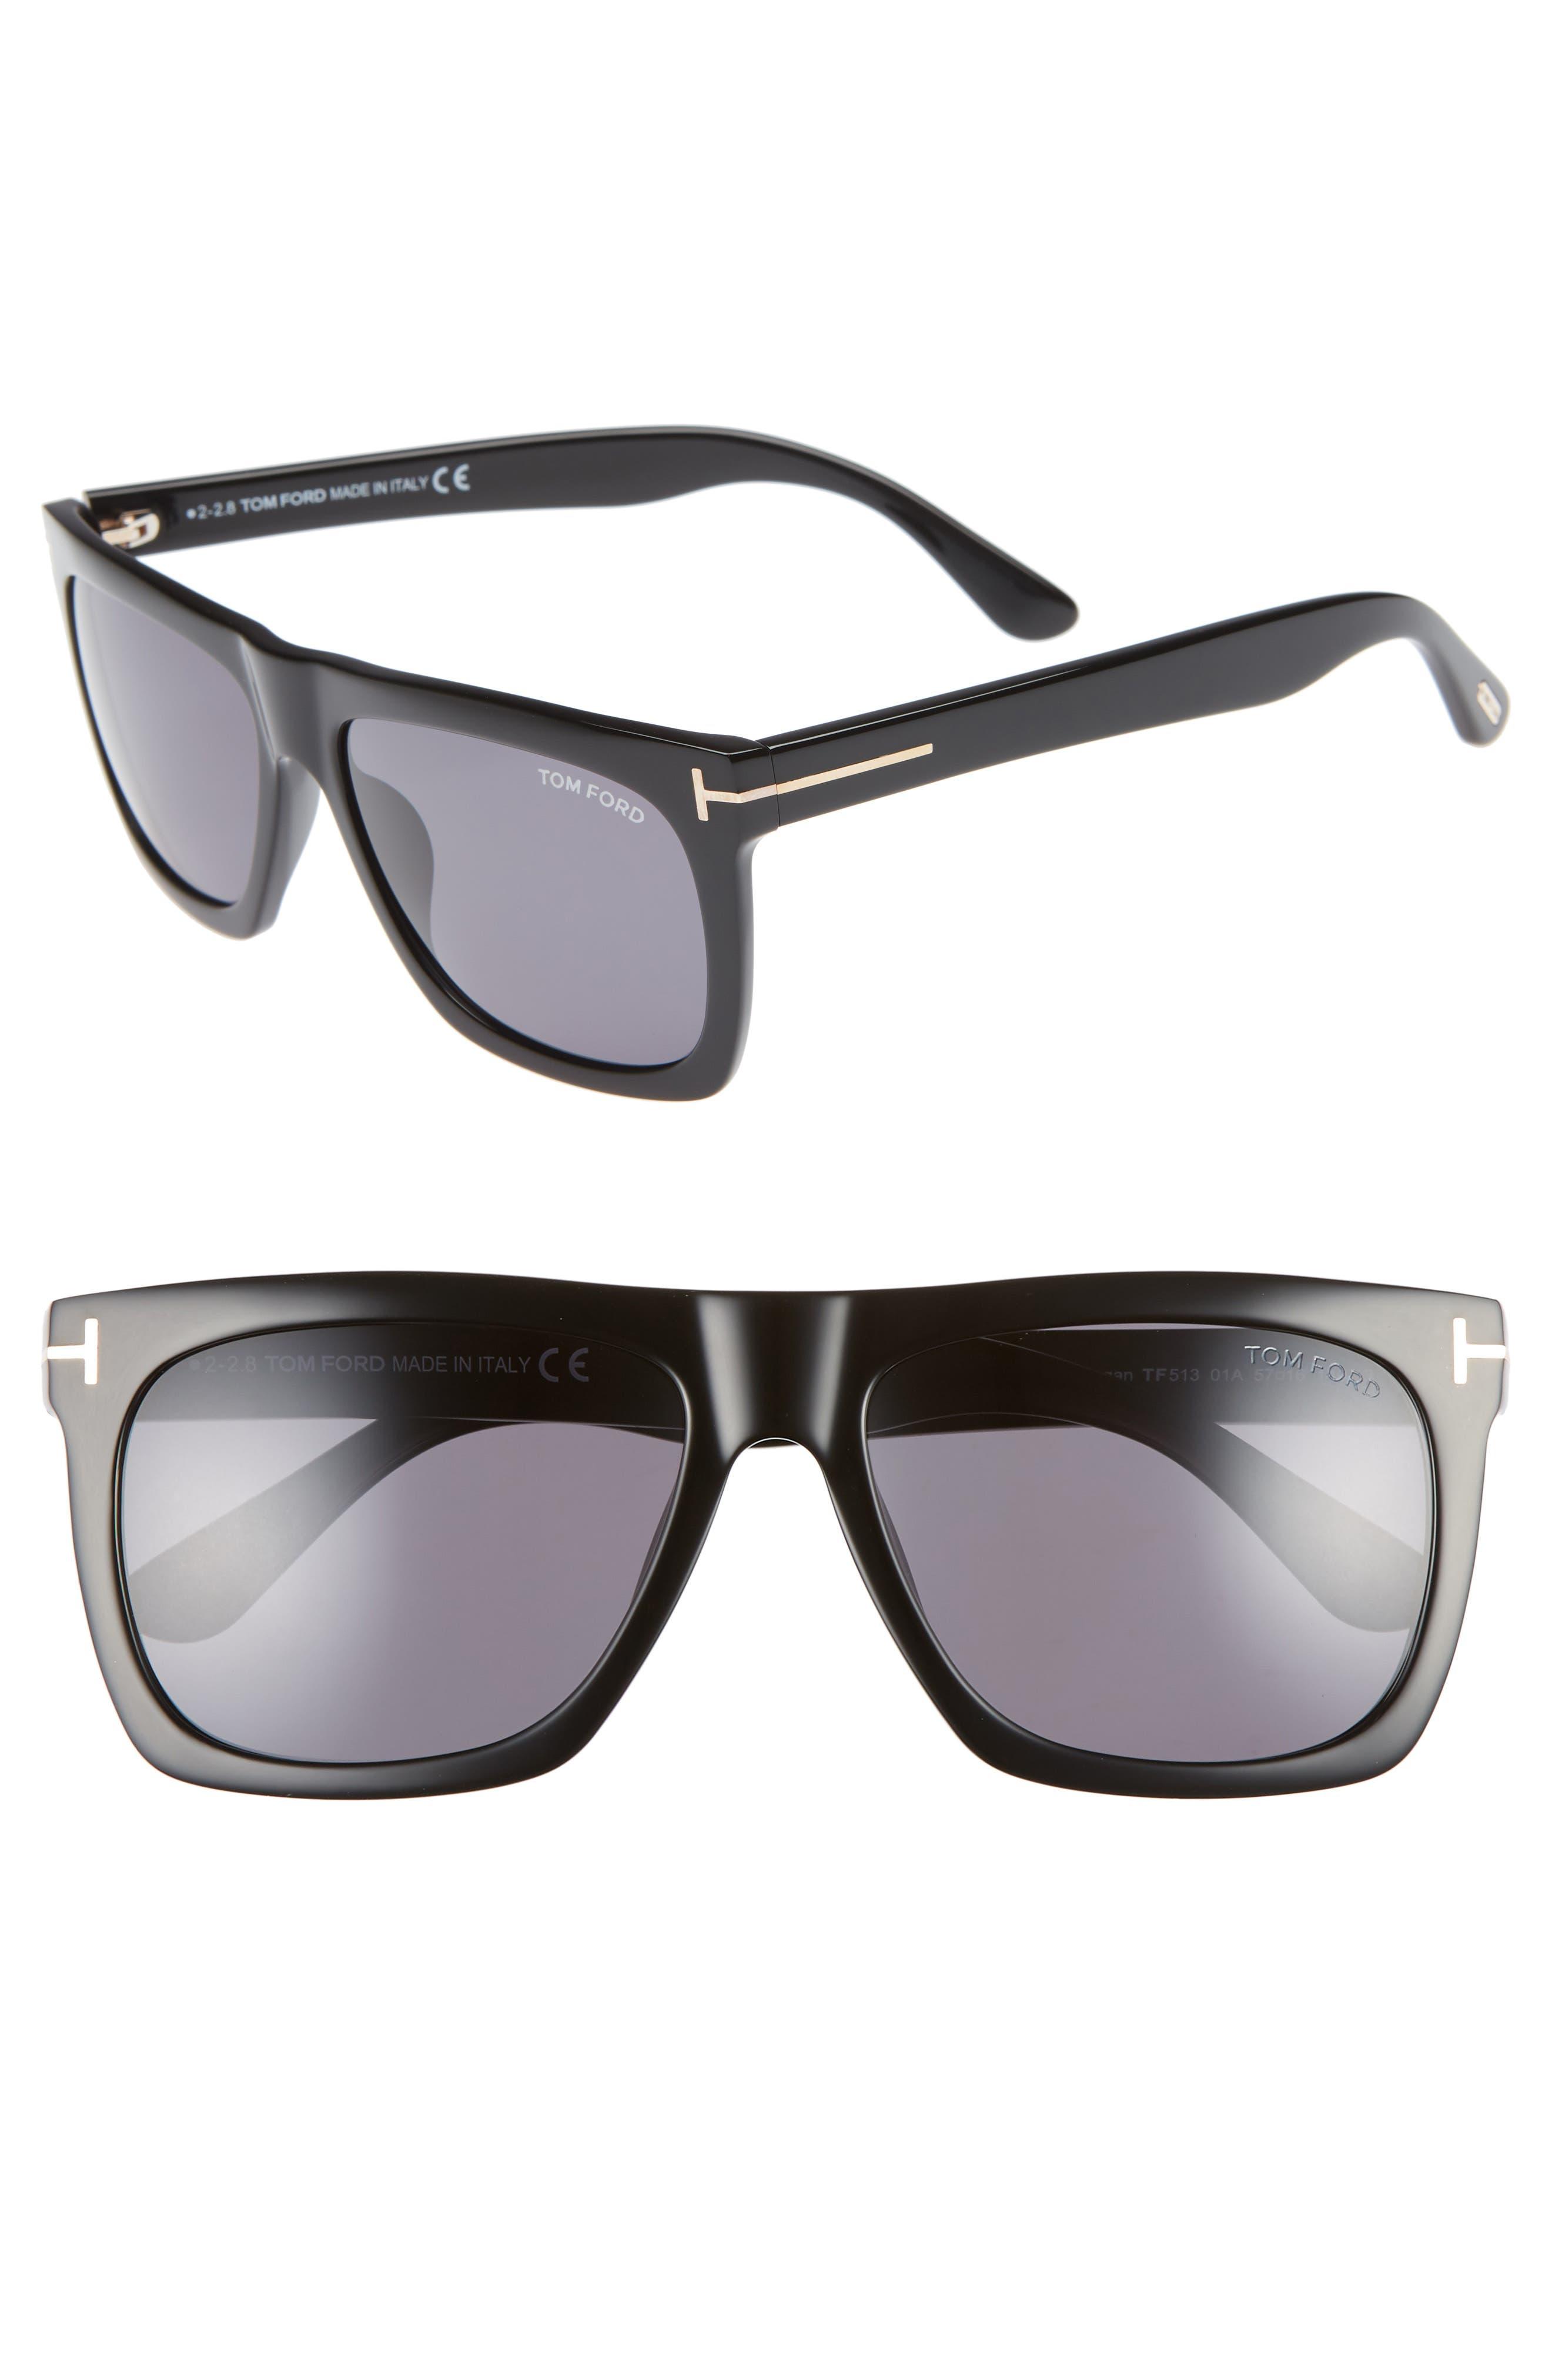 Morgan 57mm Sunglasses,                             Main thumbnail 1, color,                             SHINY BLACK / SMOKE